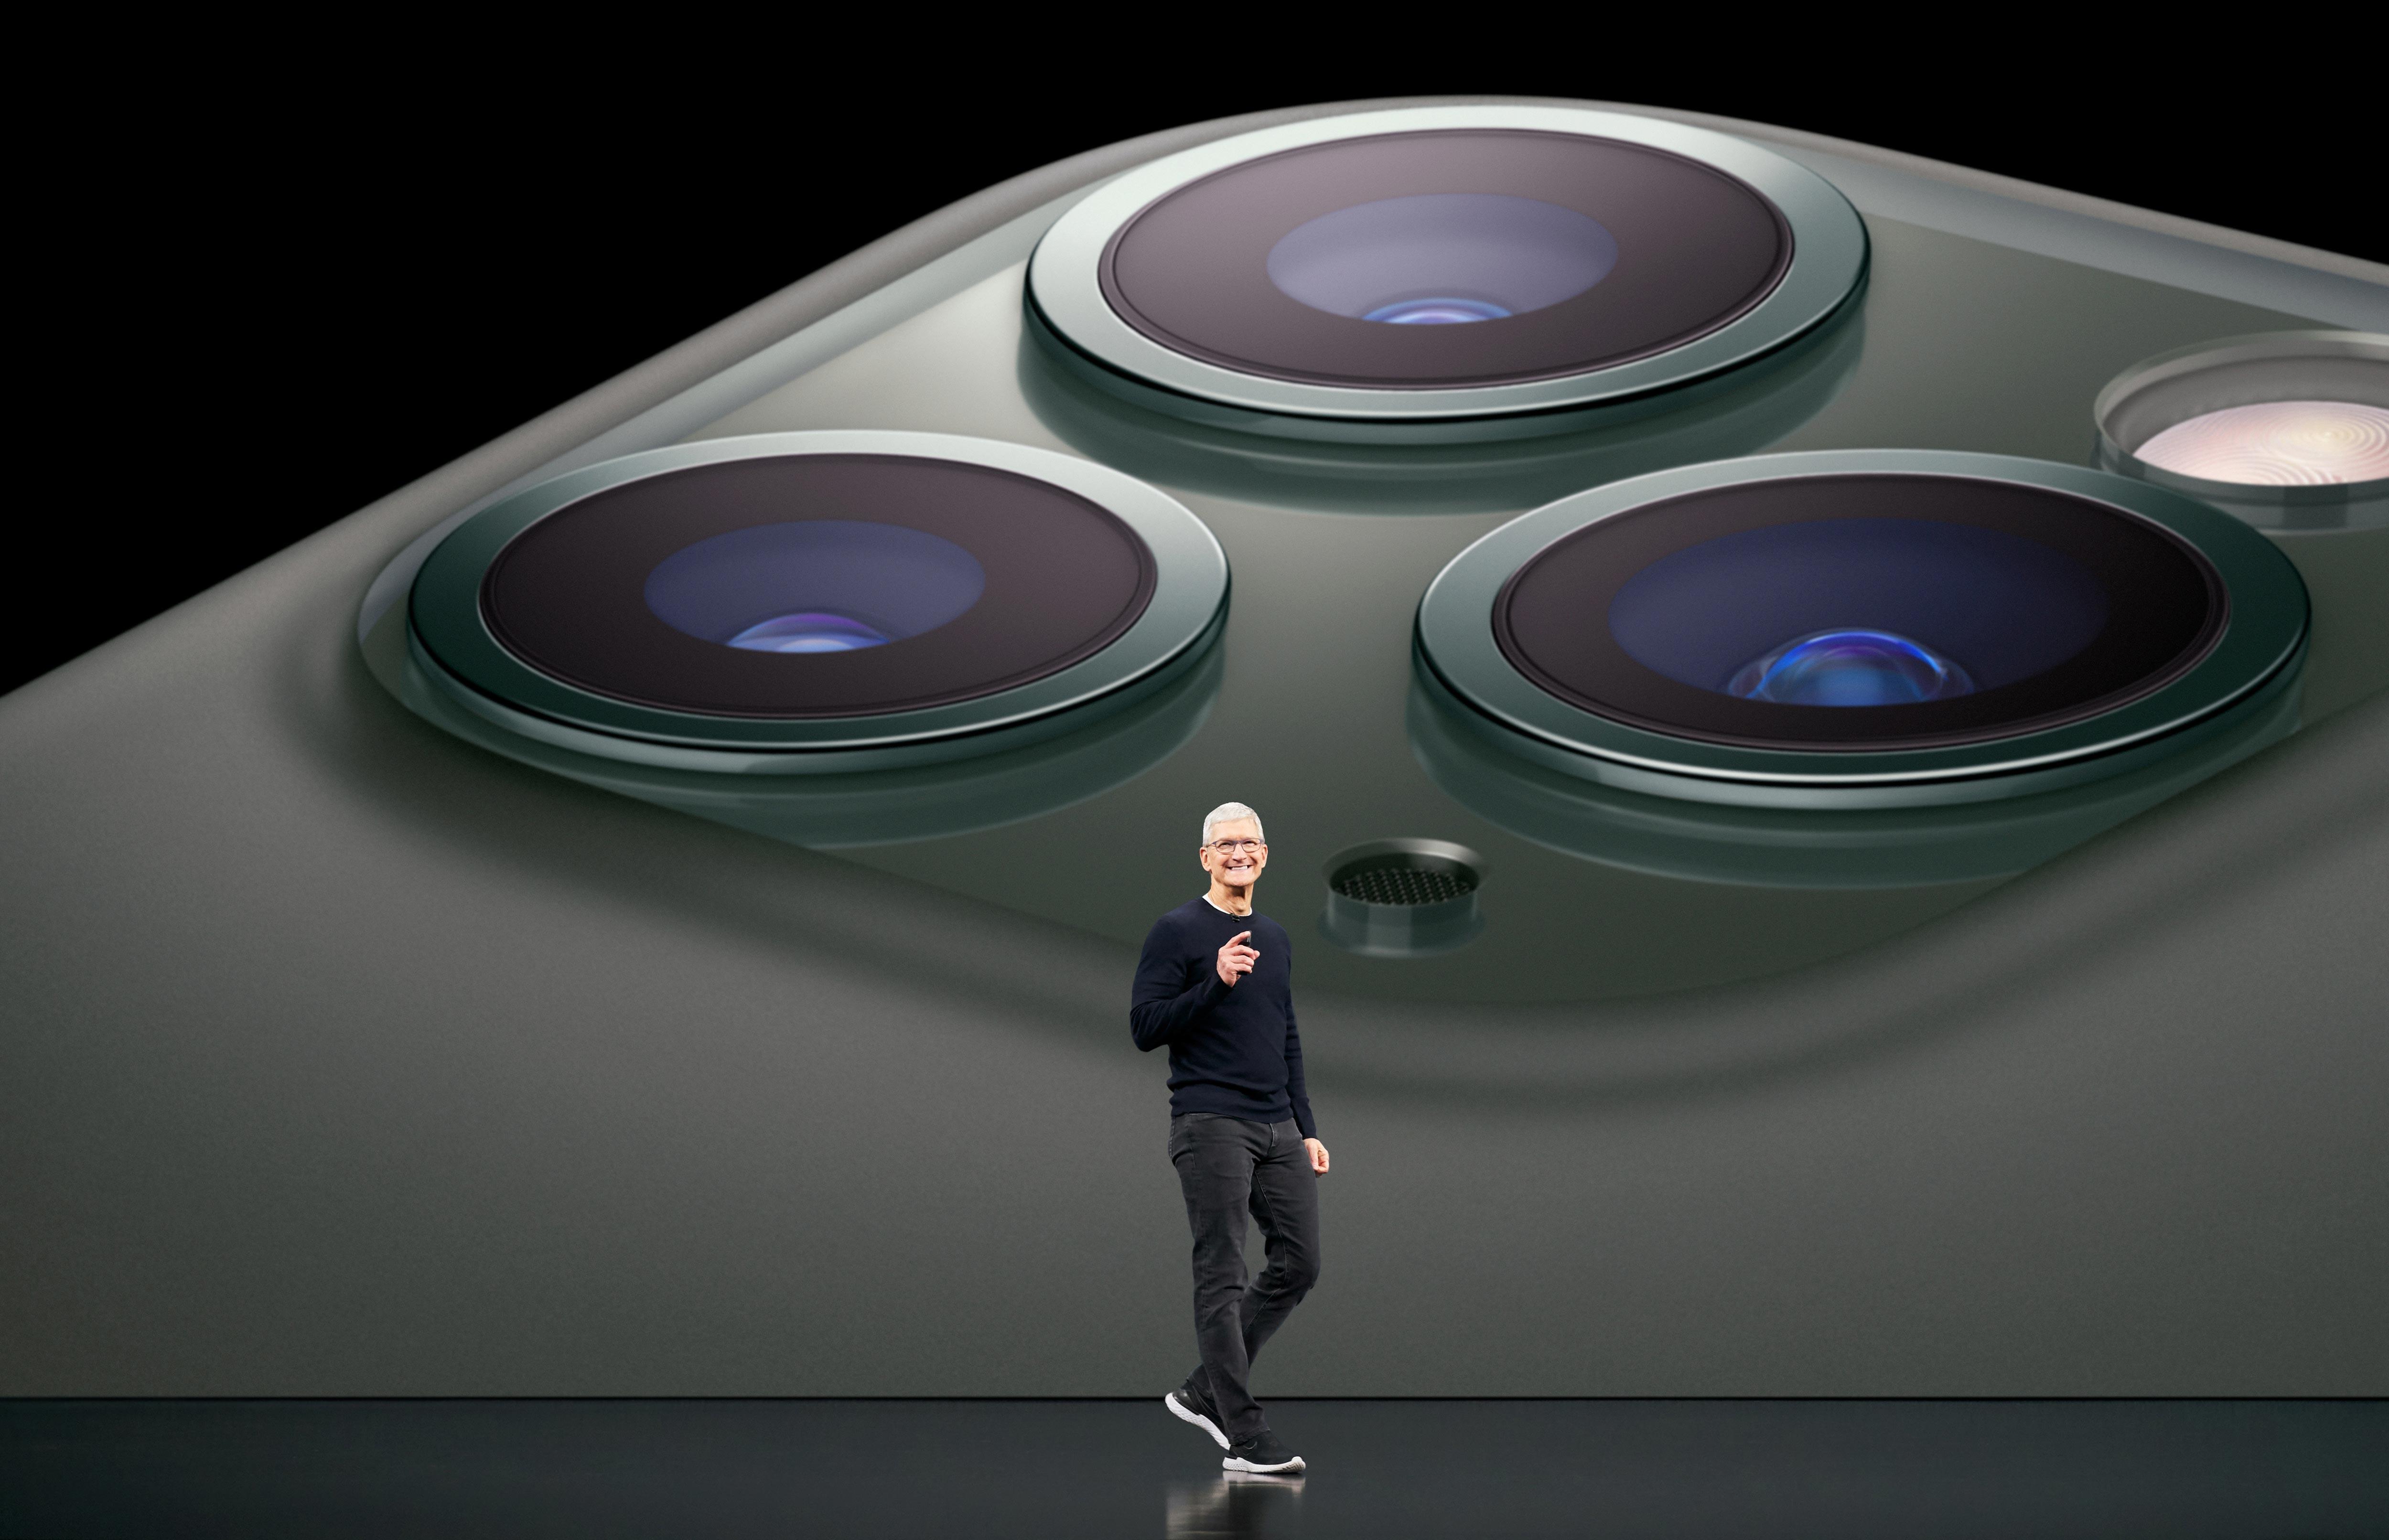 تغطية مؤتمر أبل واطلاق Apple iPhone 11 وأشقاؤه